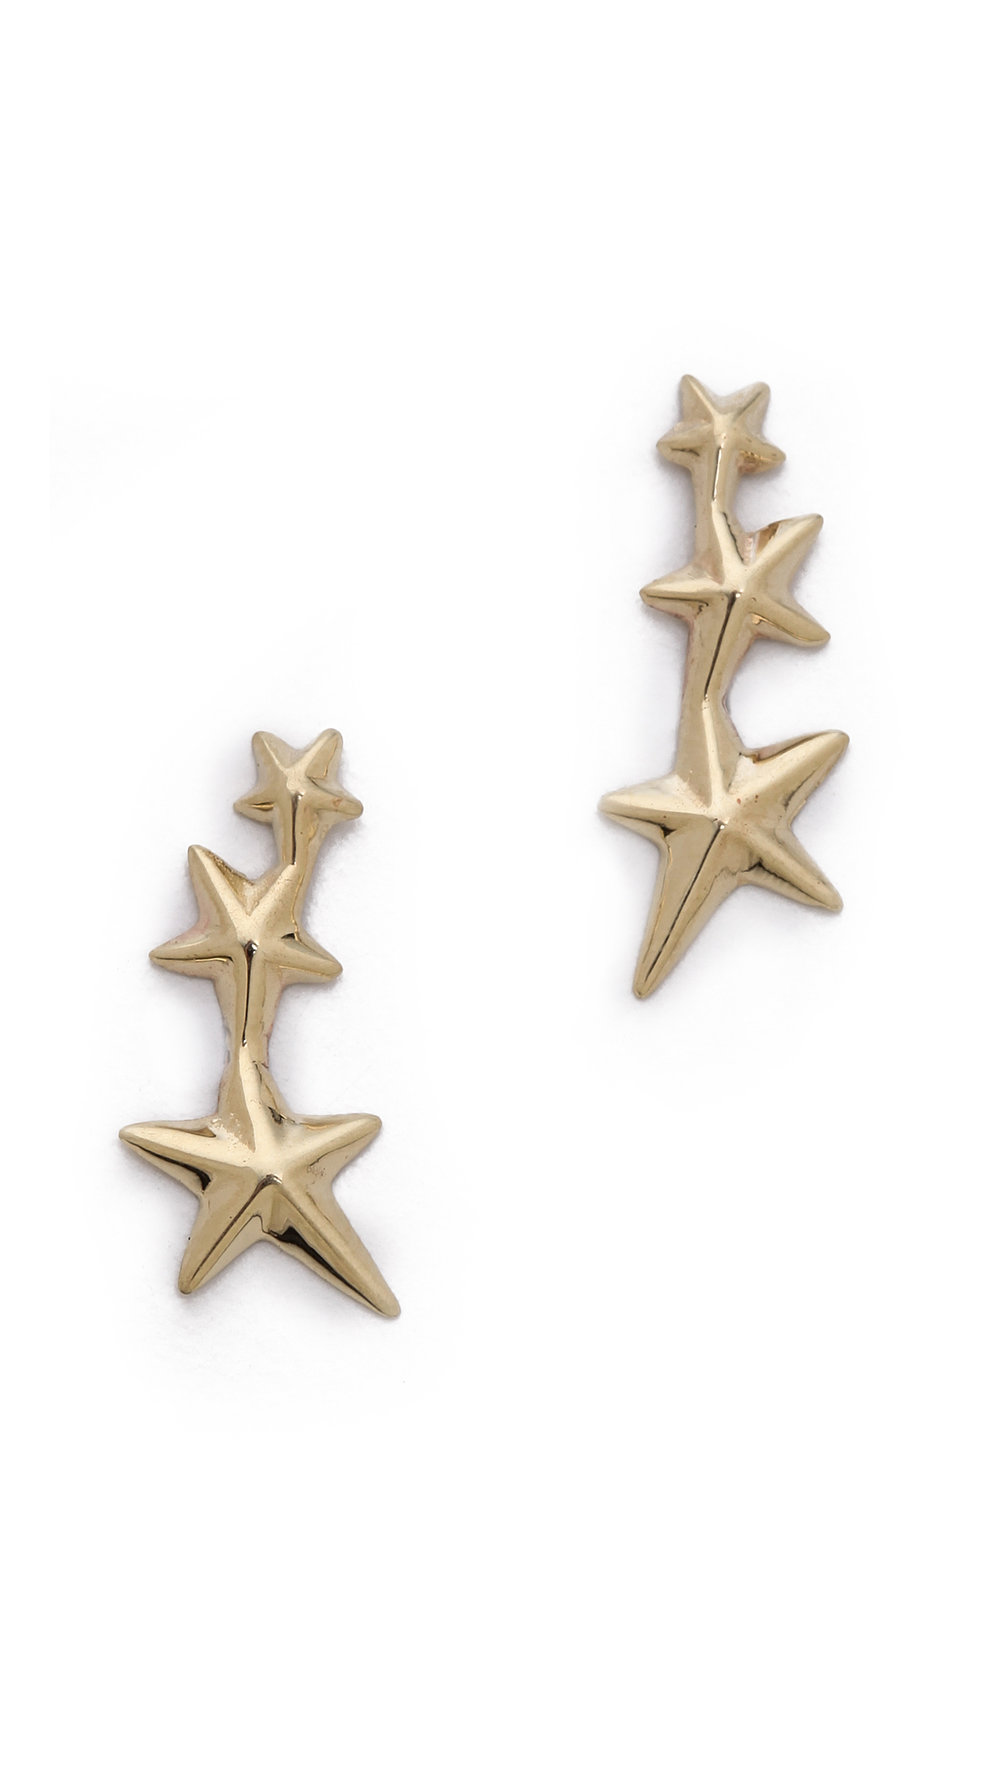 gabriela-artigas-gold-triple-shooting-star-earrings-product-1-17557886-1-262446582-normal.jpeg